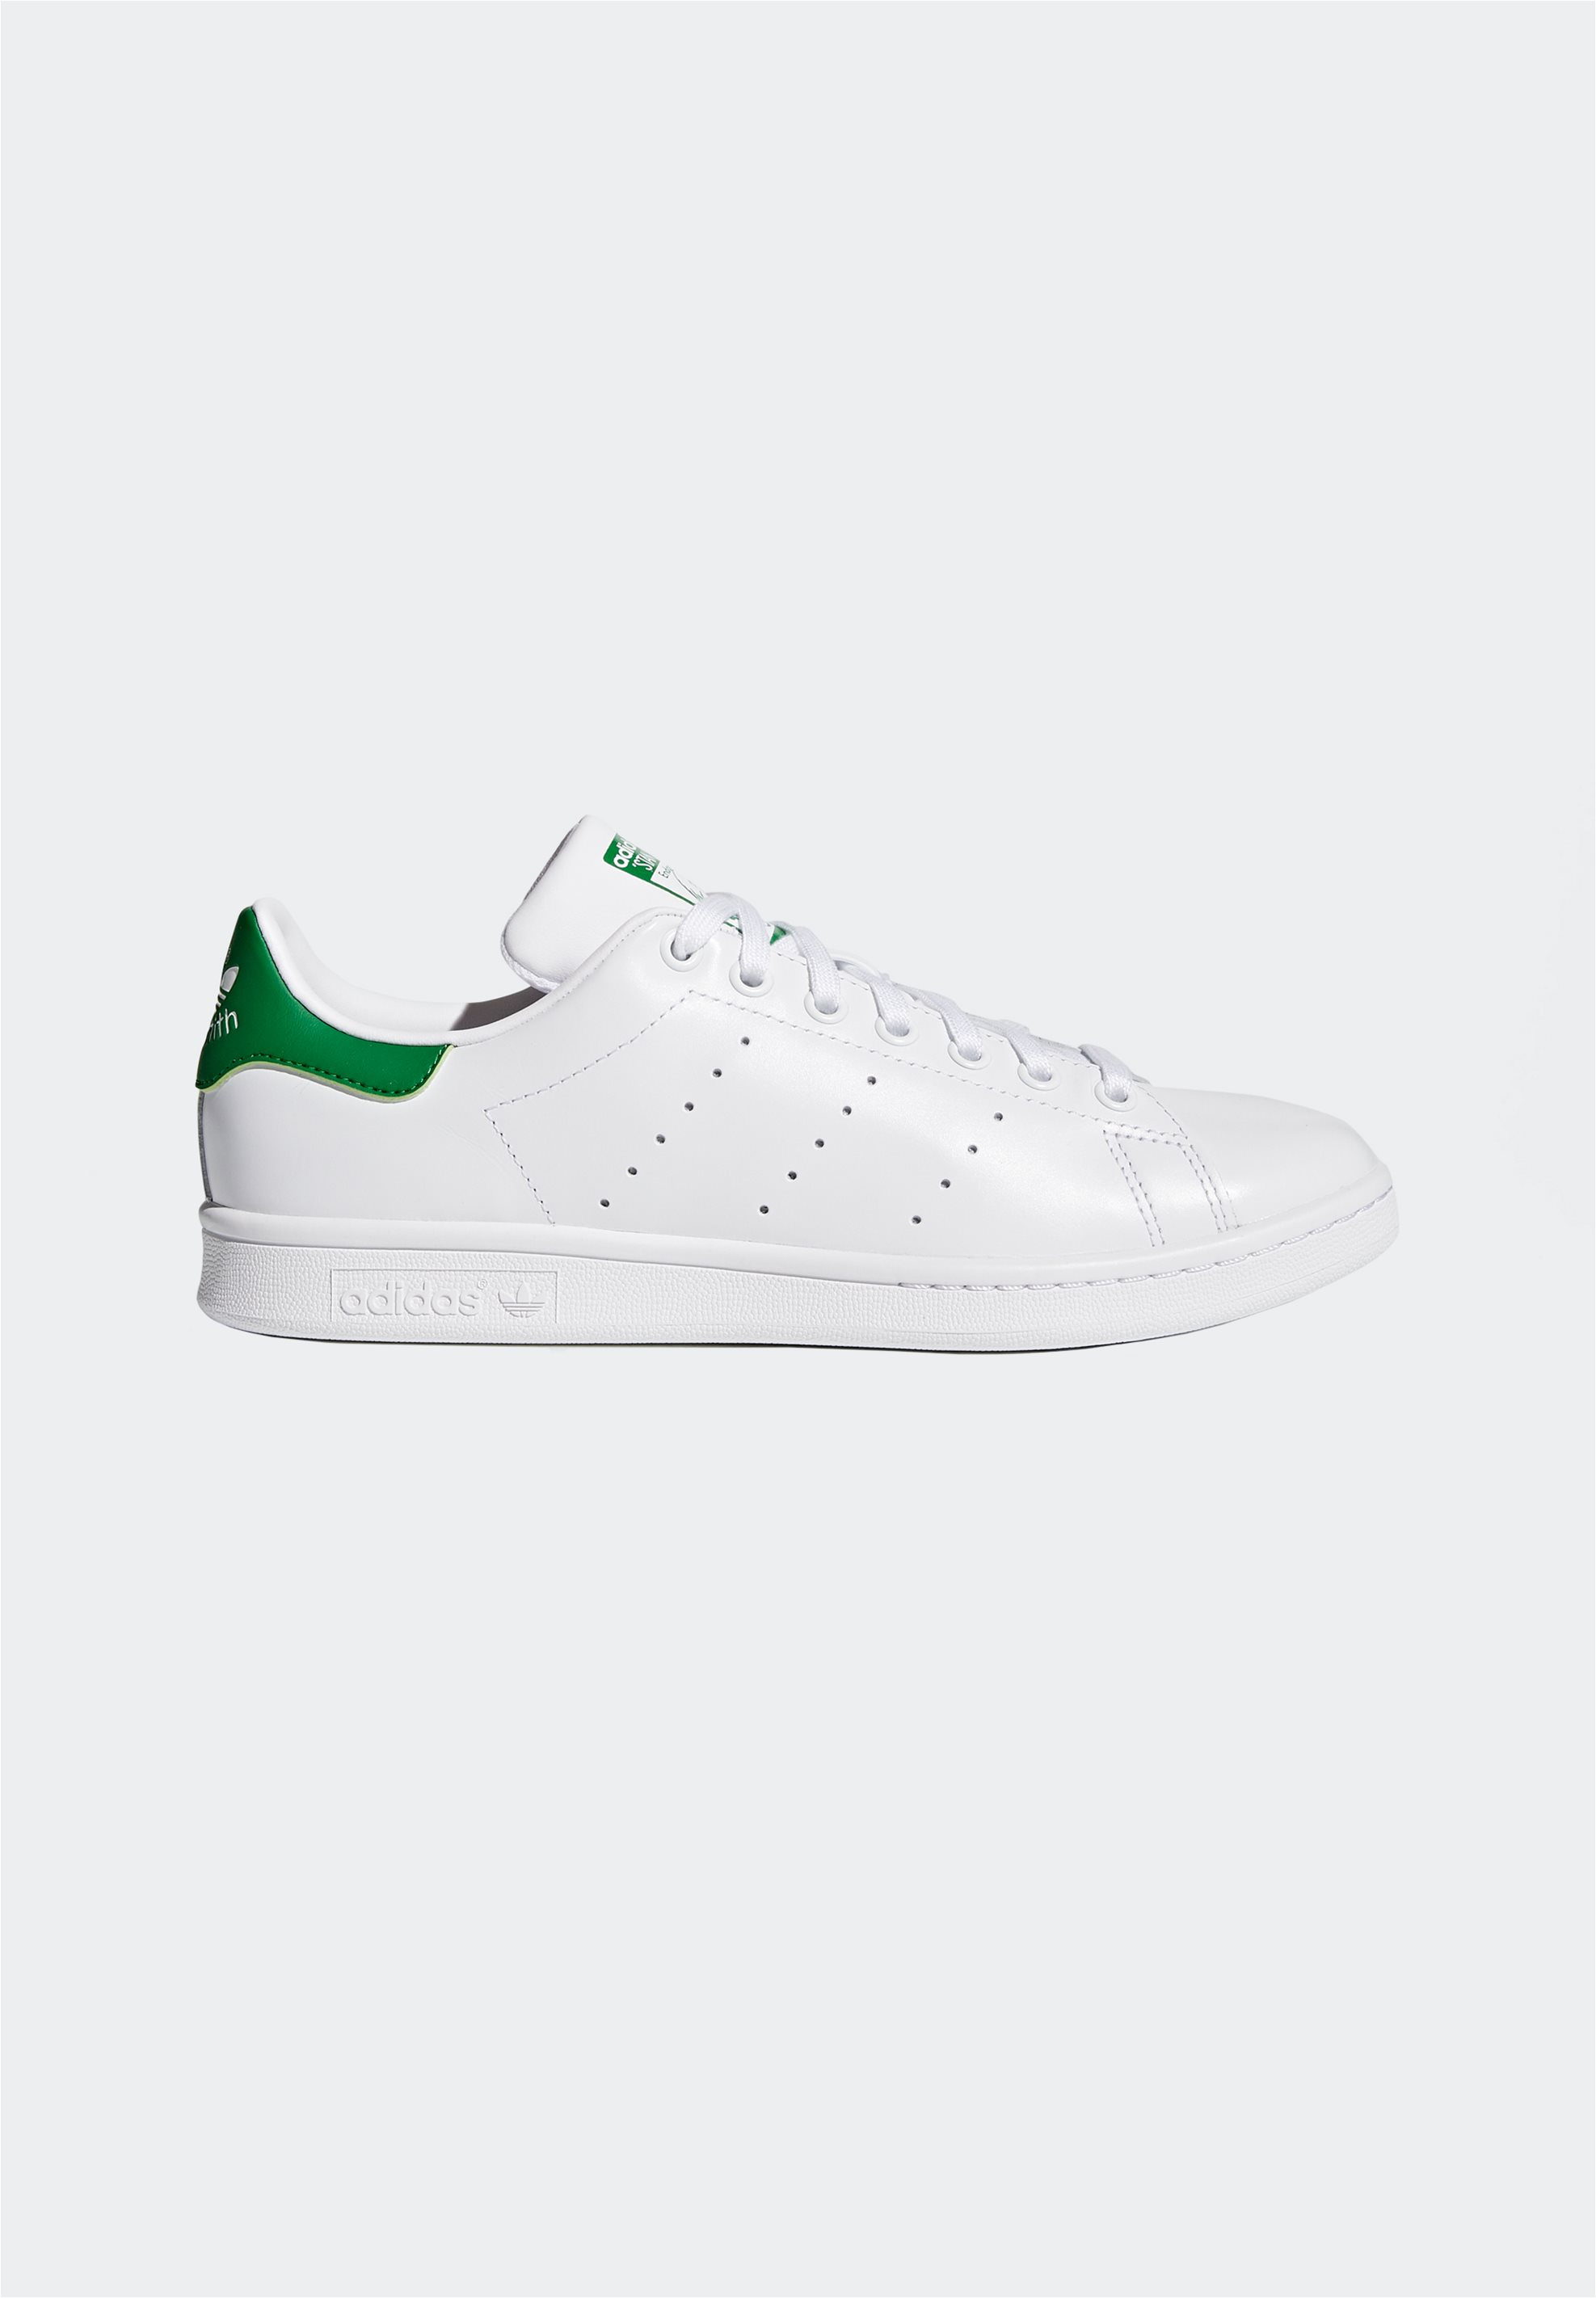 Adidas ανδρικά αθλητικά παπούτσια Stan Smith – M20324 – Άσπρο